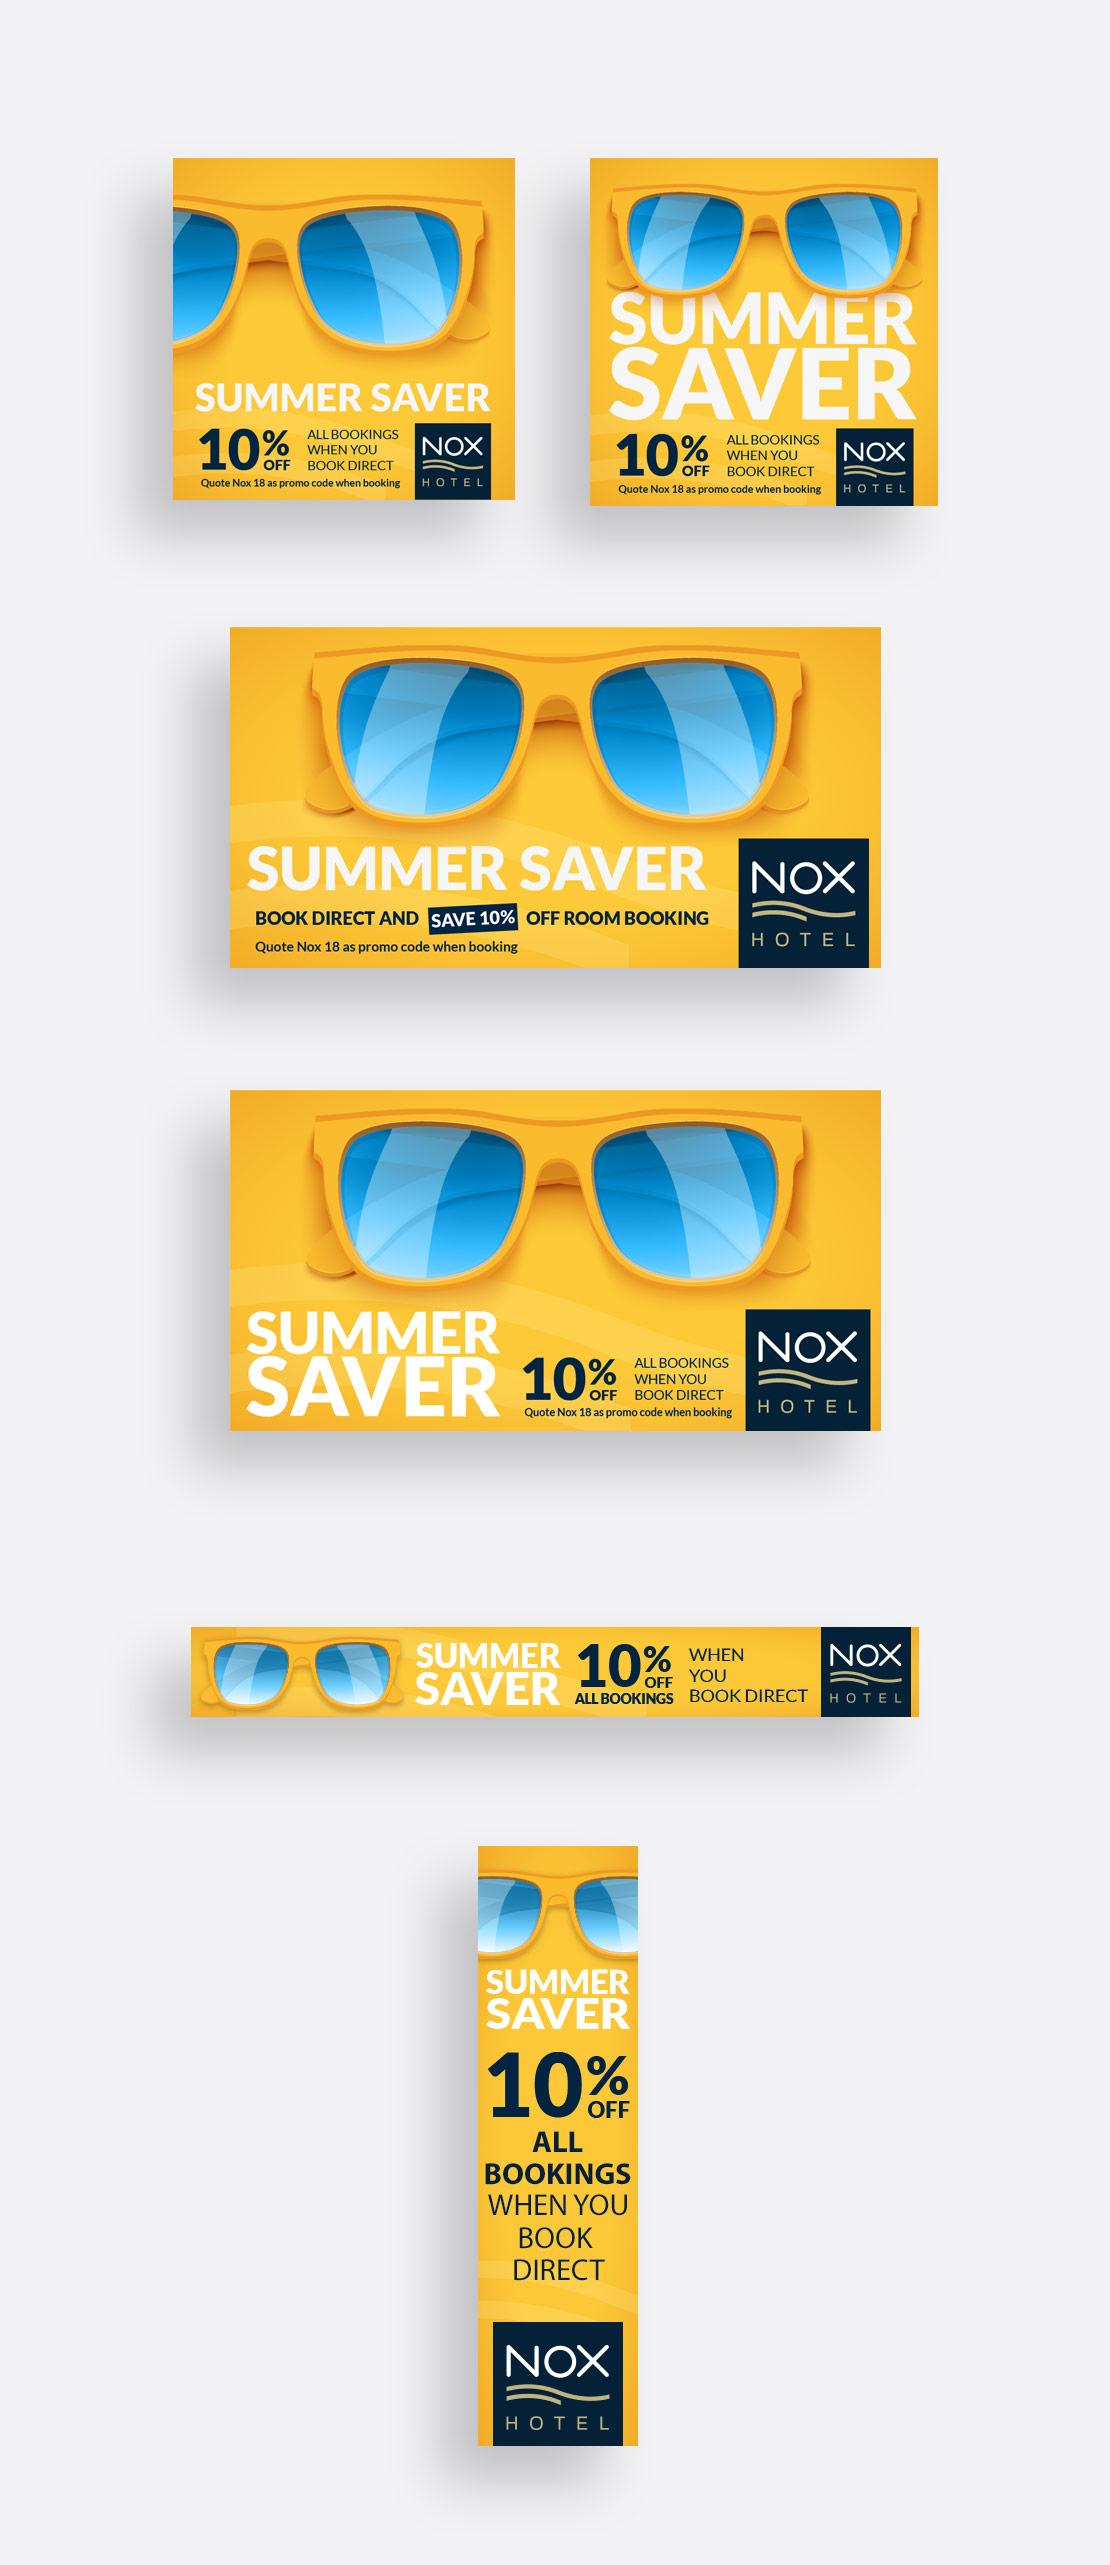 Nox Hotel 'Summer Saver' social media and online advertising campaign